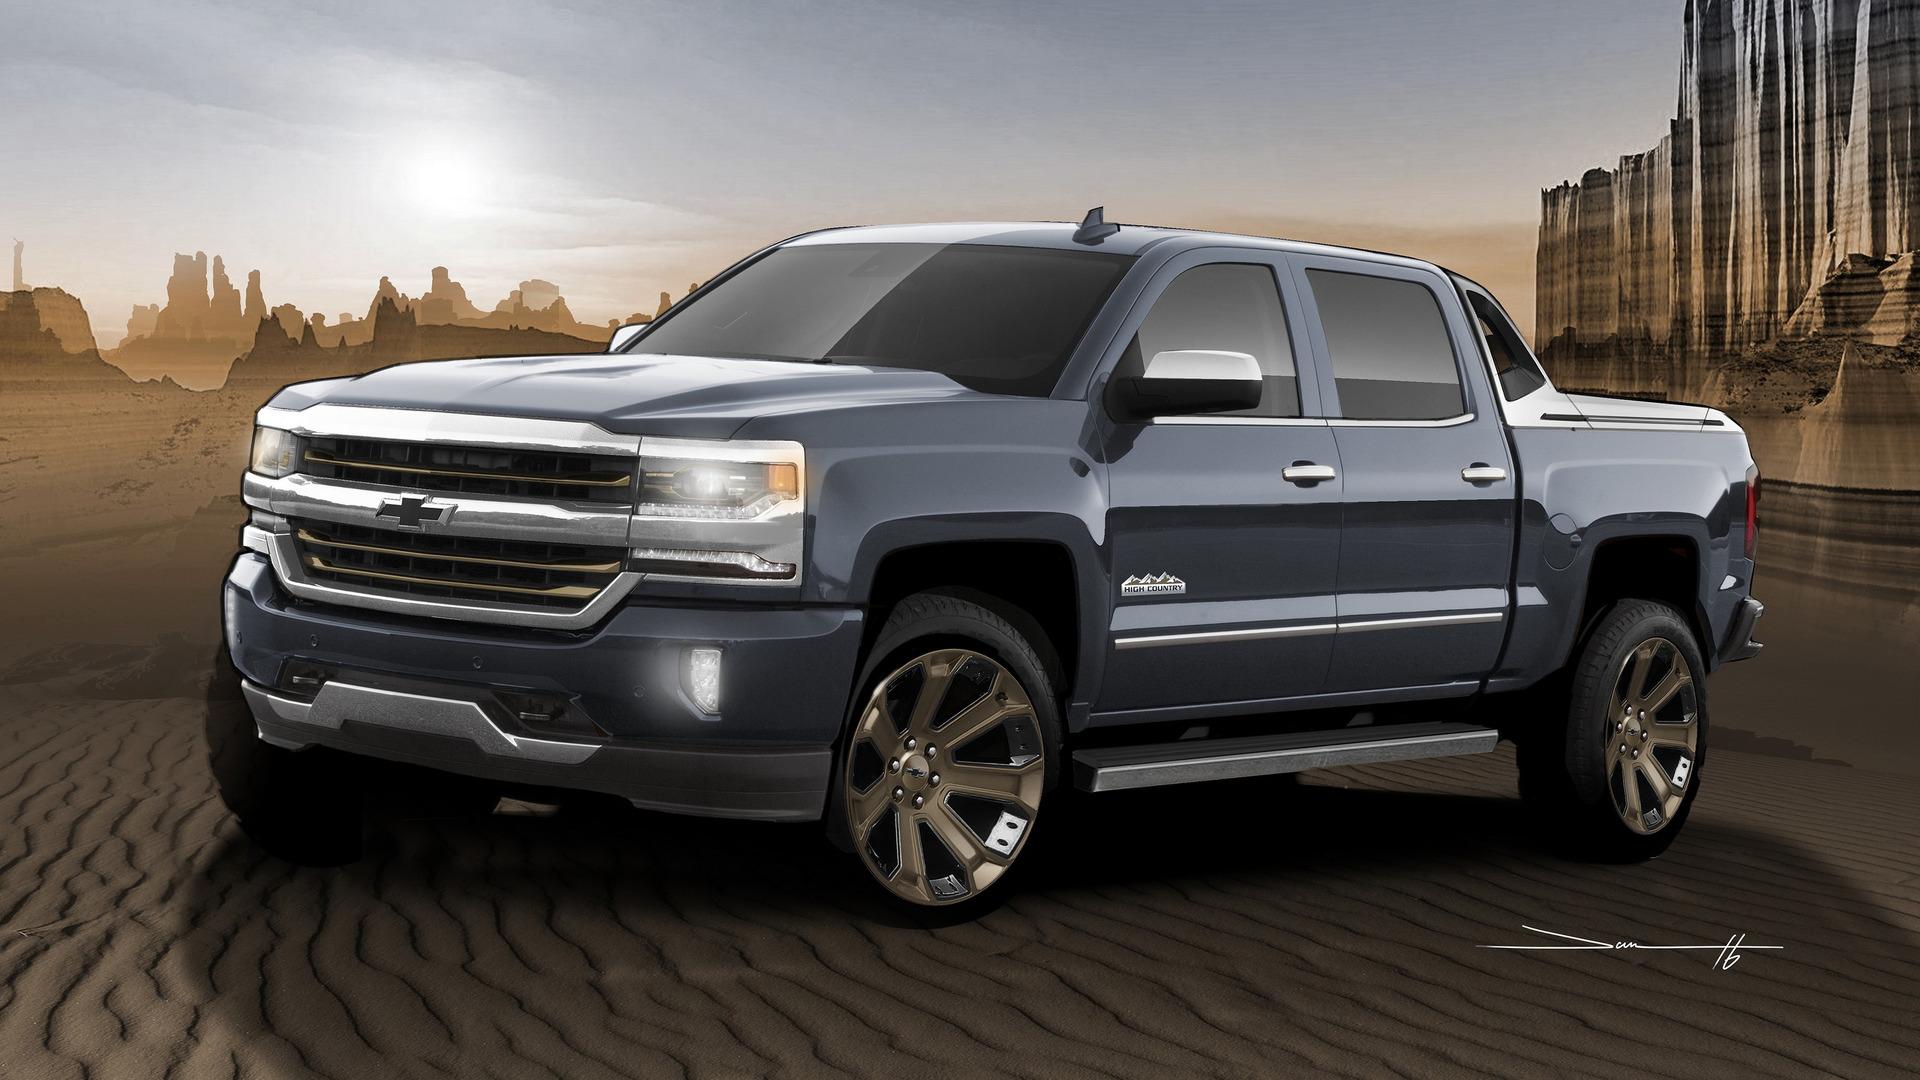 2015 Silverado For Sale >> Chevy Silverado SEMA concepts are ready for winter and desert dunes